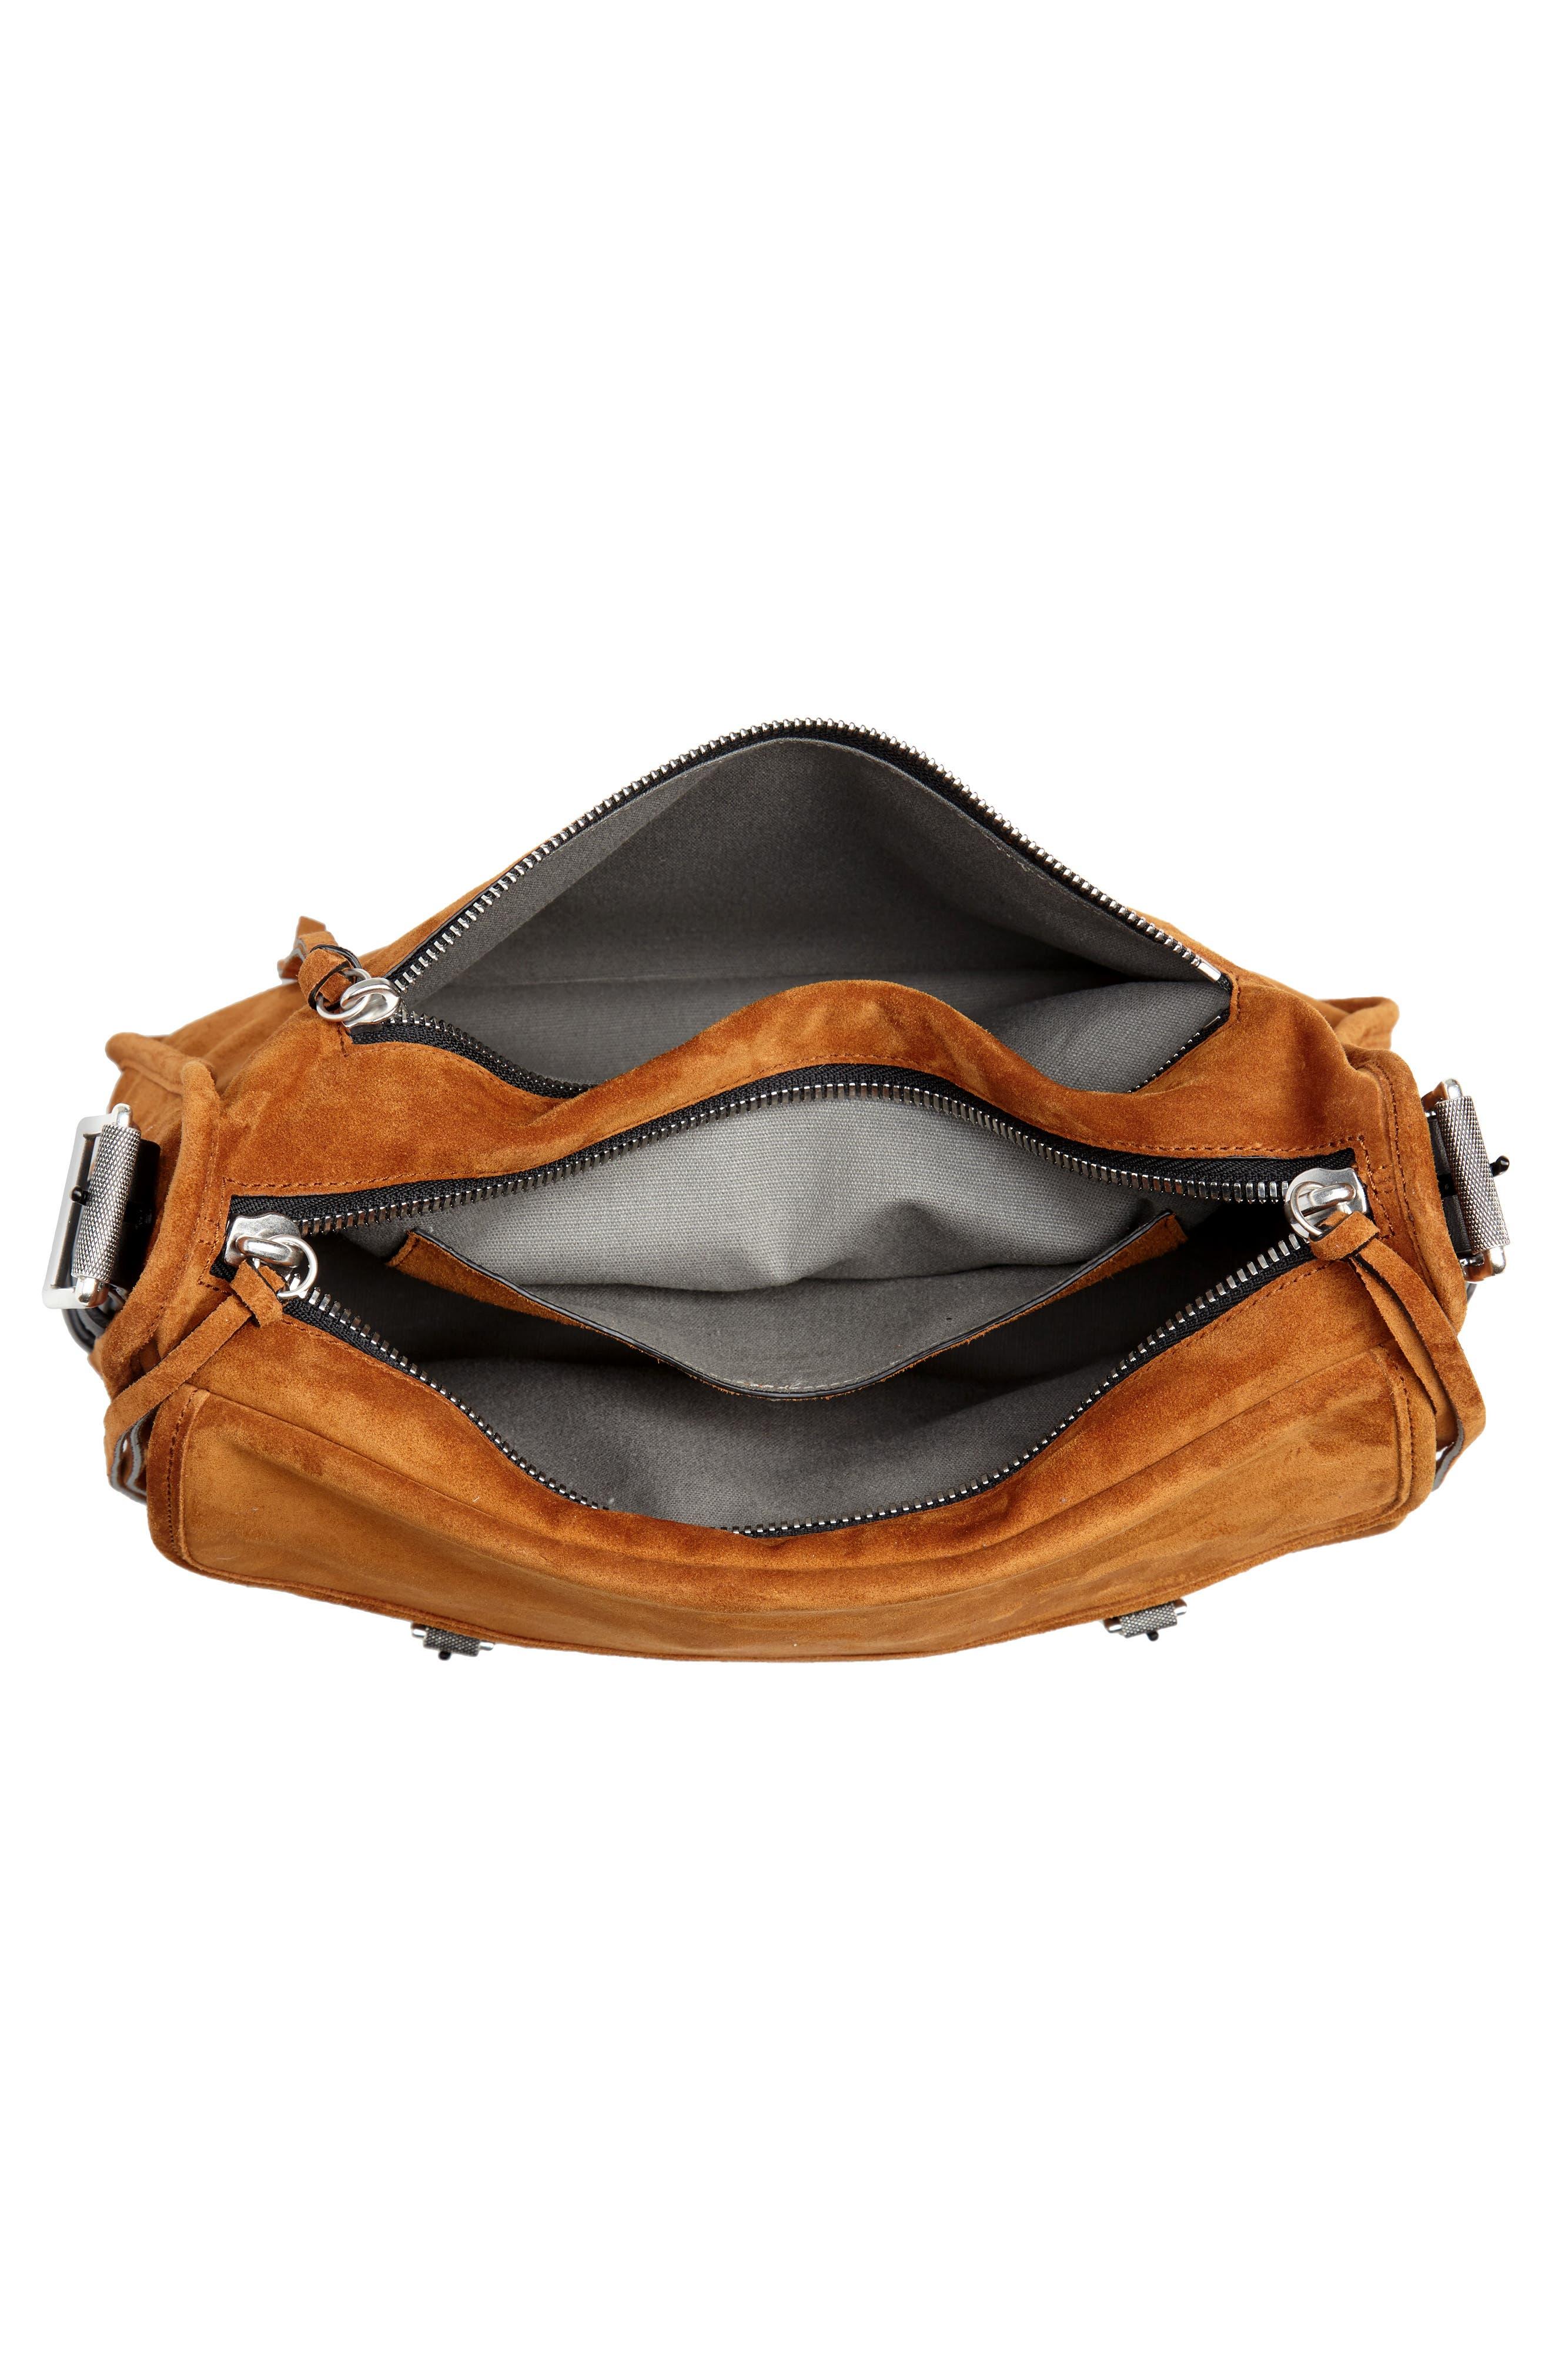 Field Leather Messenger Bag,                             Alternate thumbnail 4, color,                             TAN SUEDE